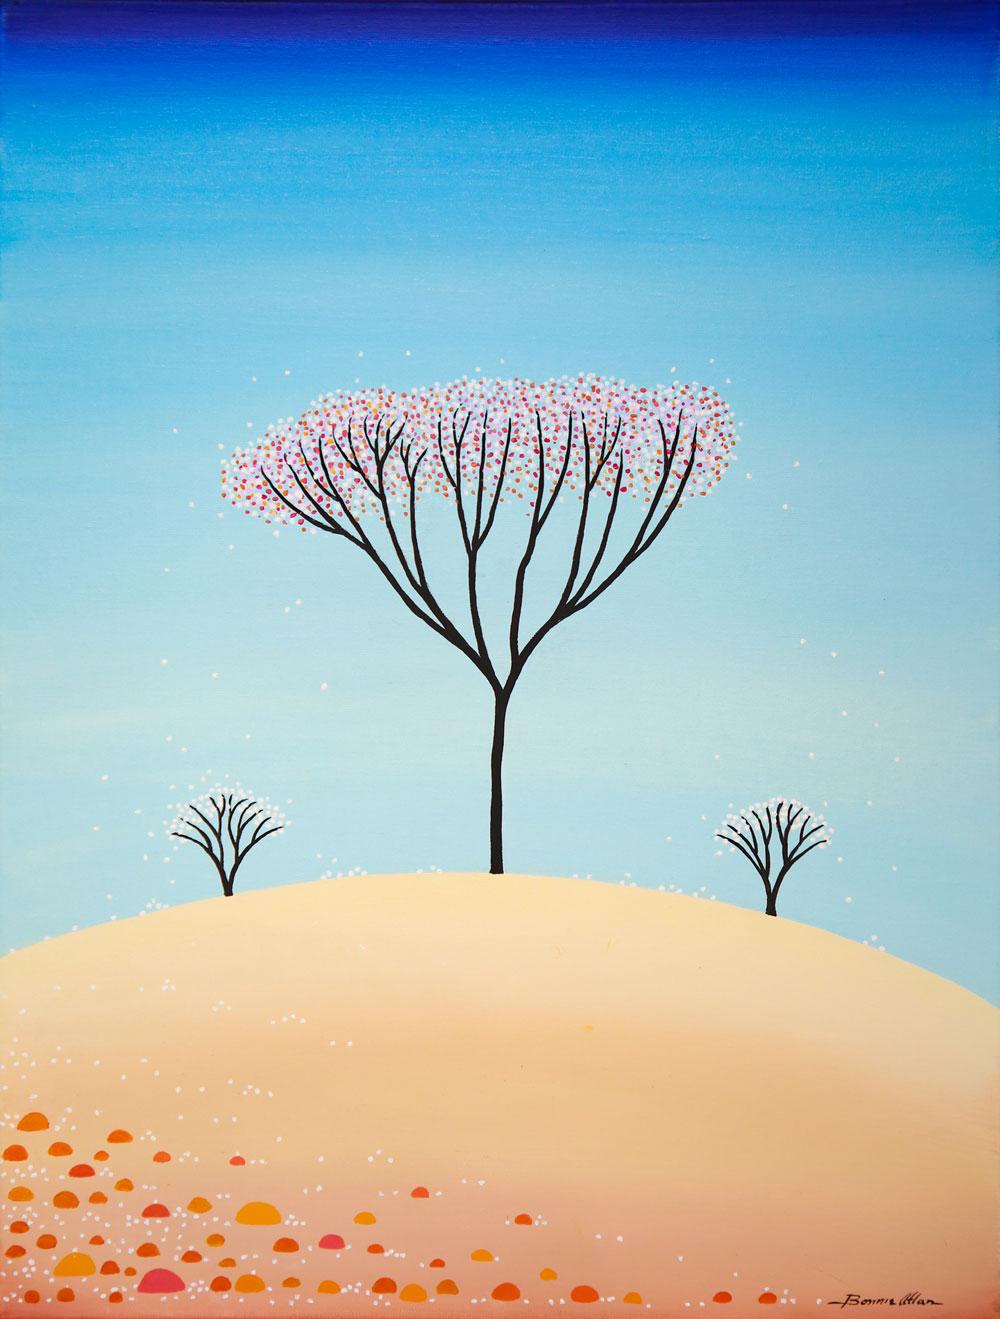 Joy of Spring - 45 x 61 cm - $2,200